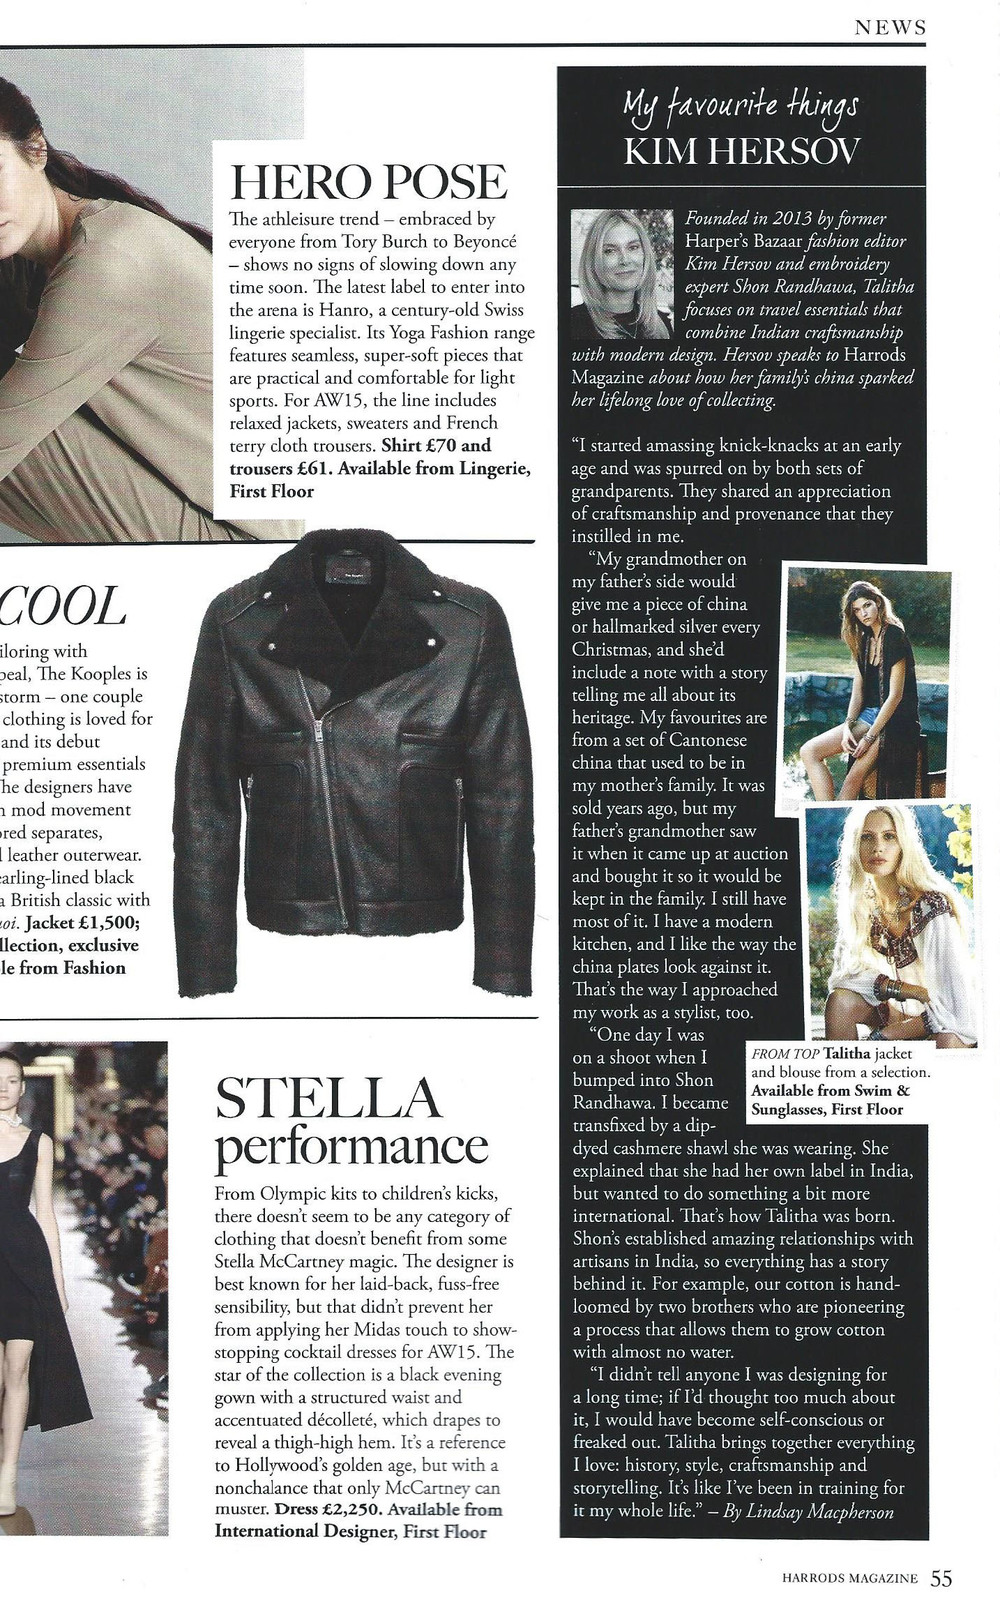 Harrod's Magazine